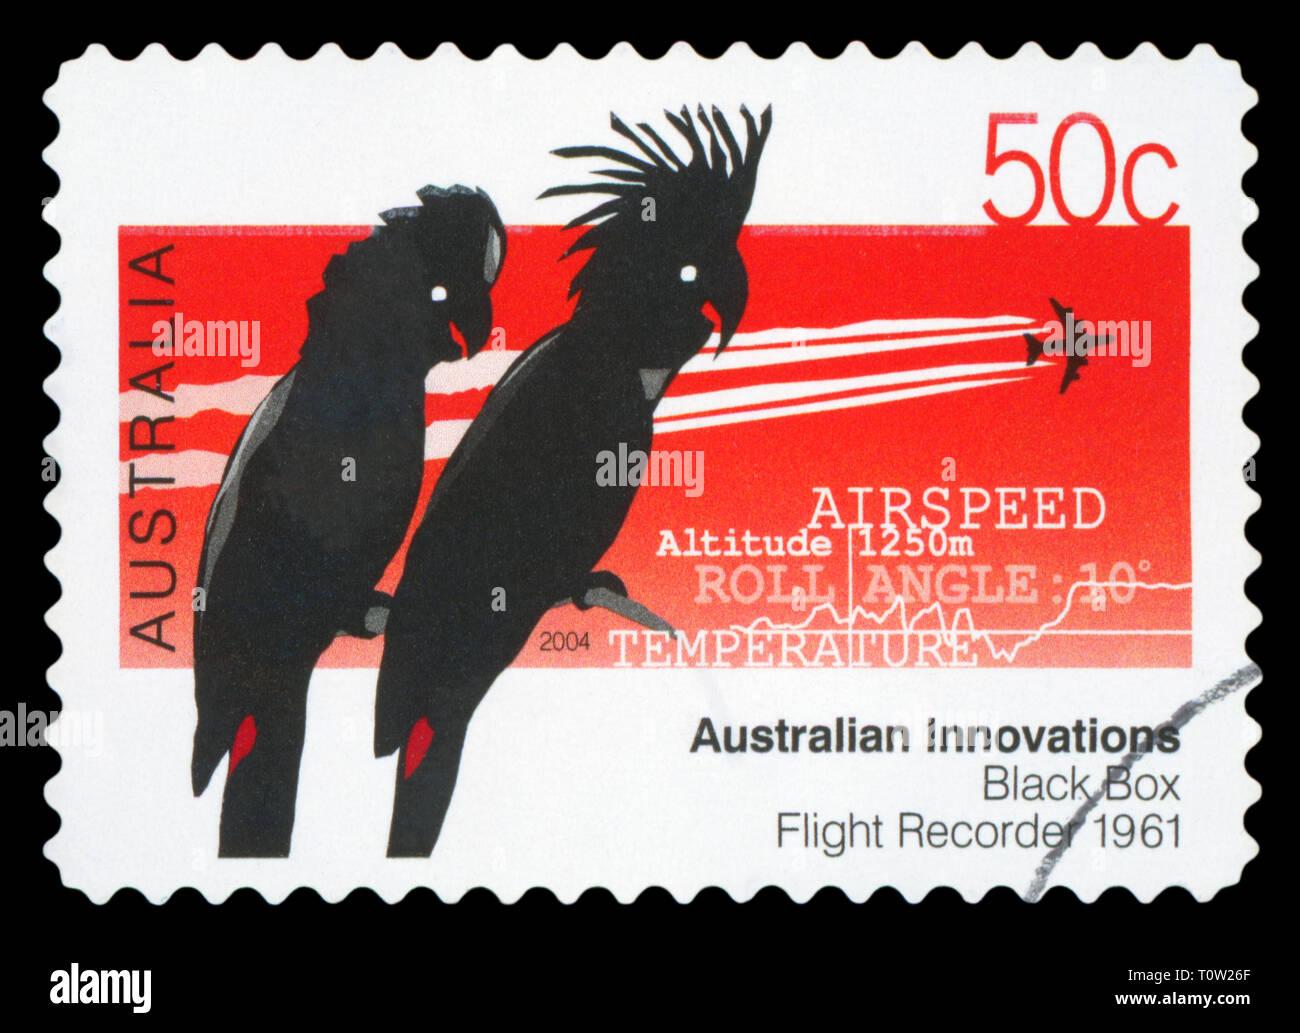 AUSTRALIA - CIRCA 2004: A used postage stamp from Australia, celebrating Australian Innovations - the Black Box Flight Recorder, circa 2004. - Stock Image